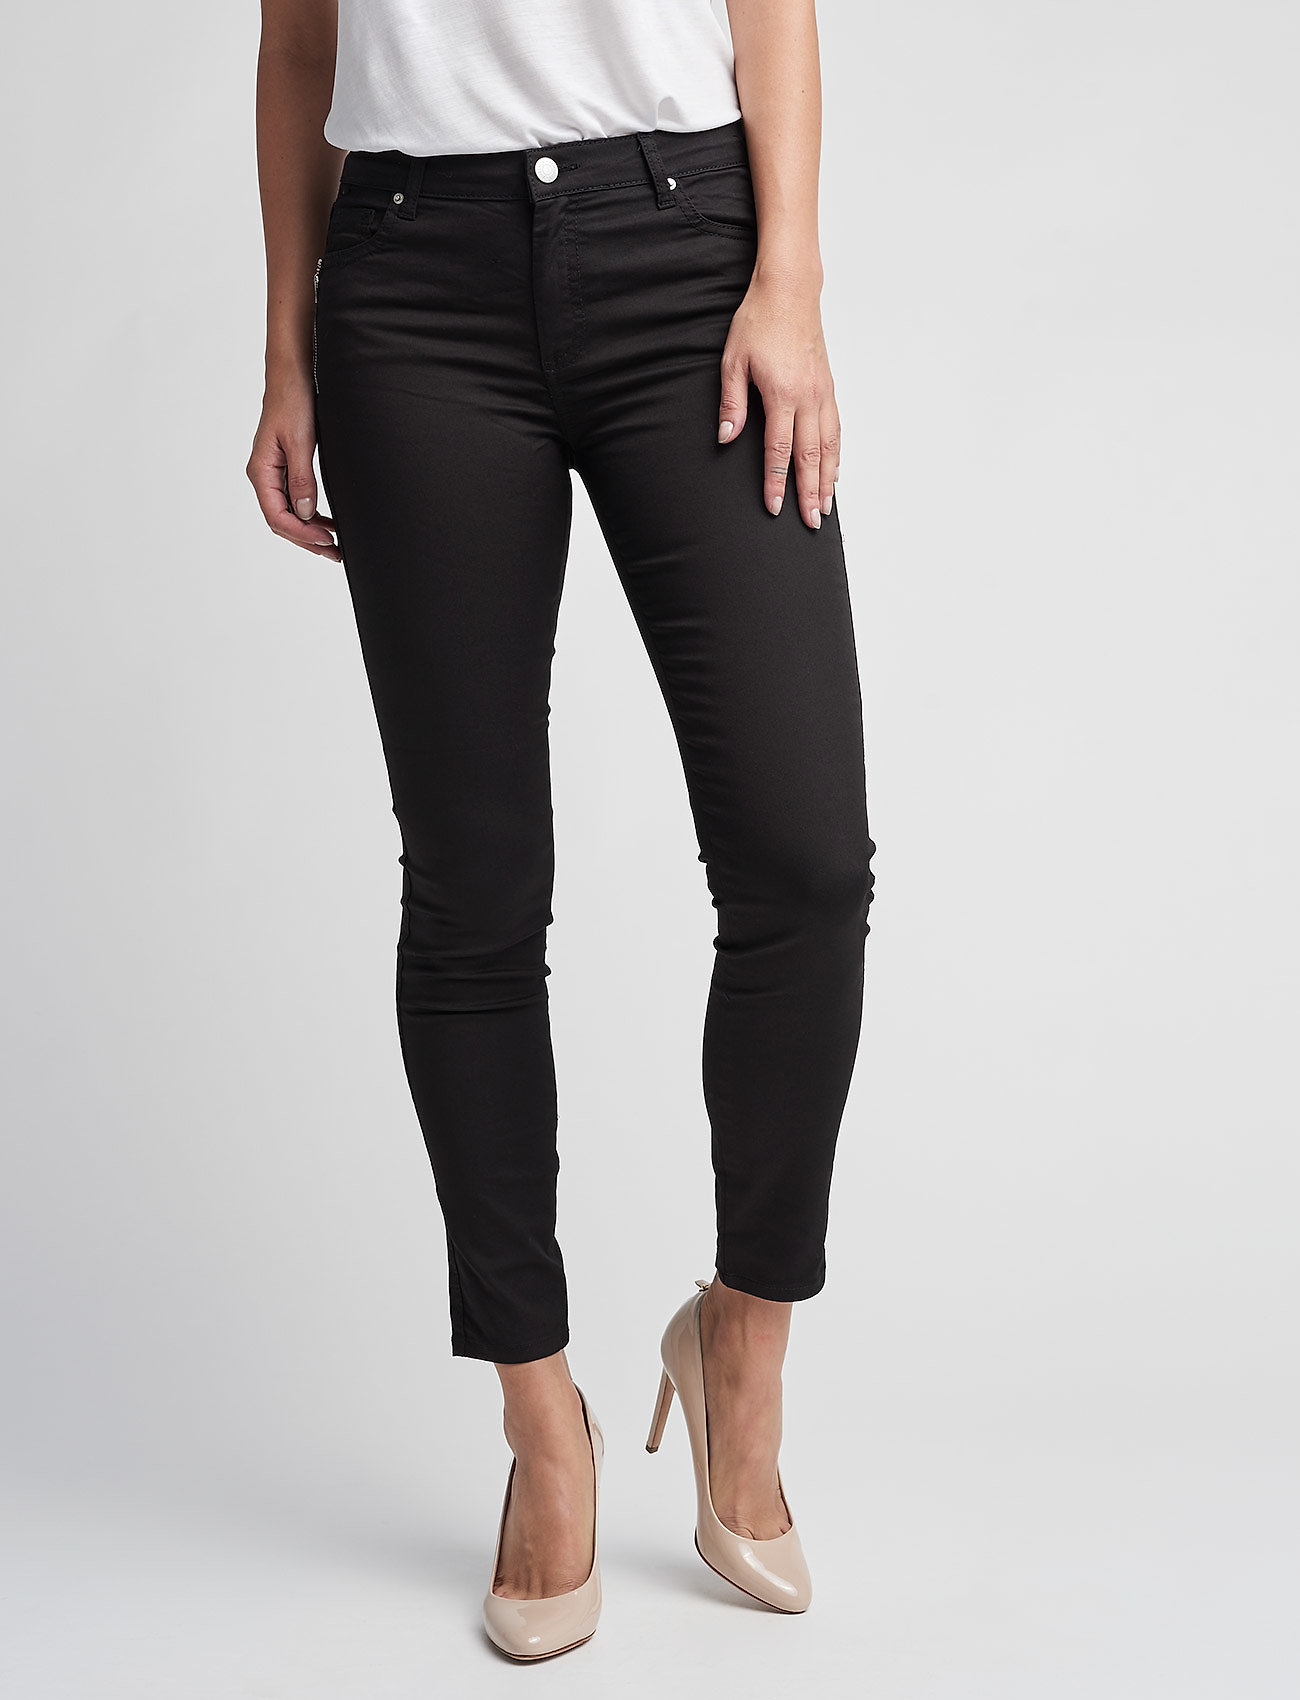 FIVEUNITS - Penelope 266 Zip, Black Line, Jeans - skinny jeans - black line - 0